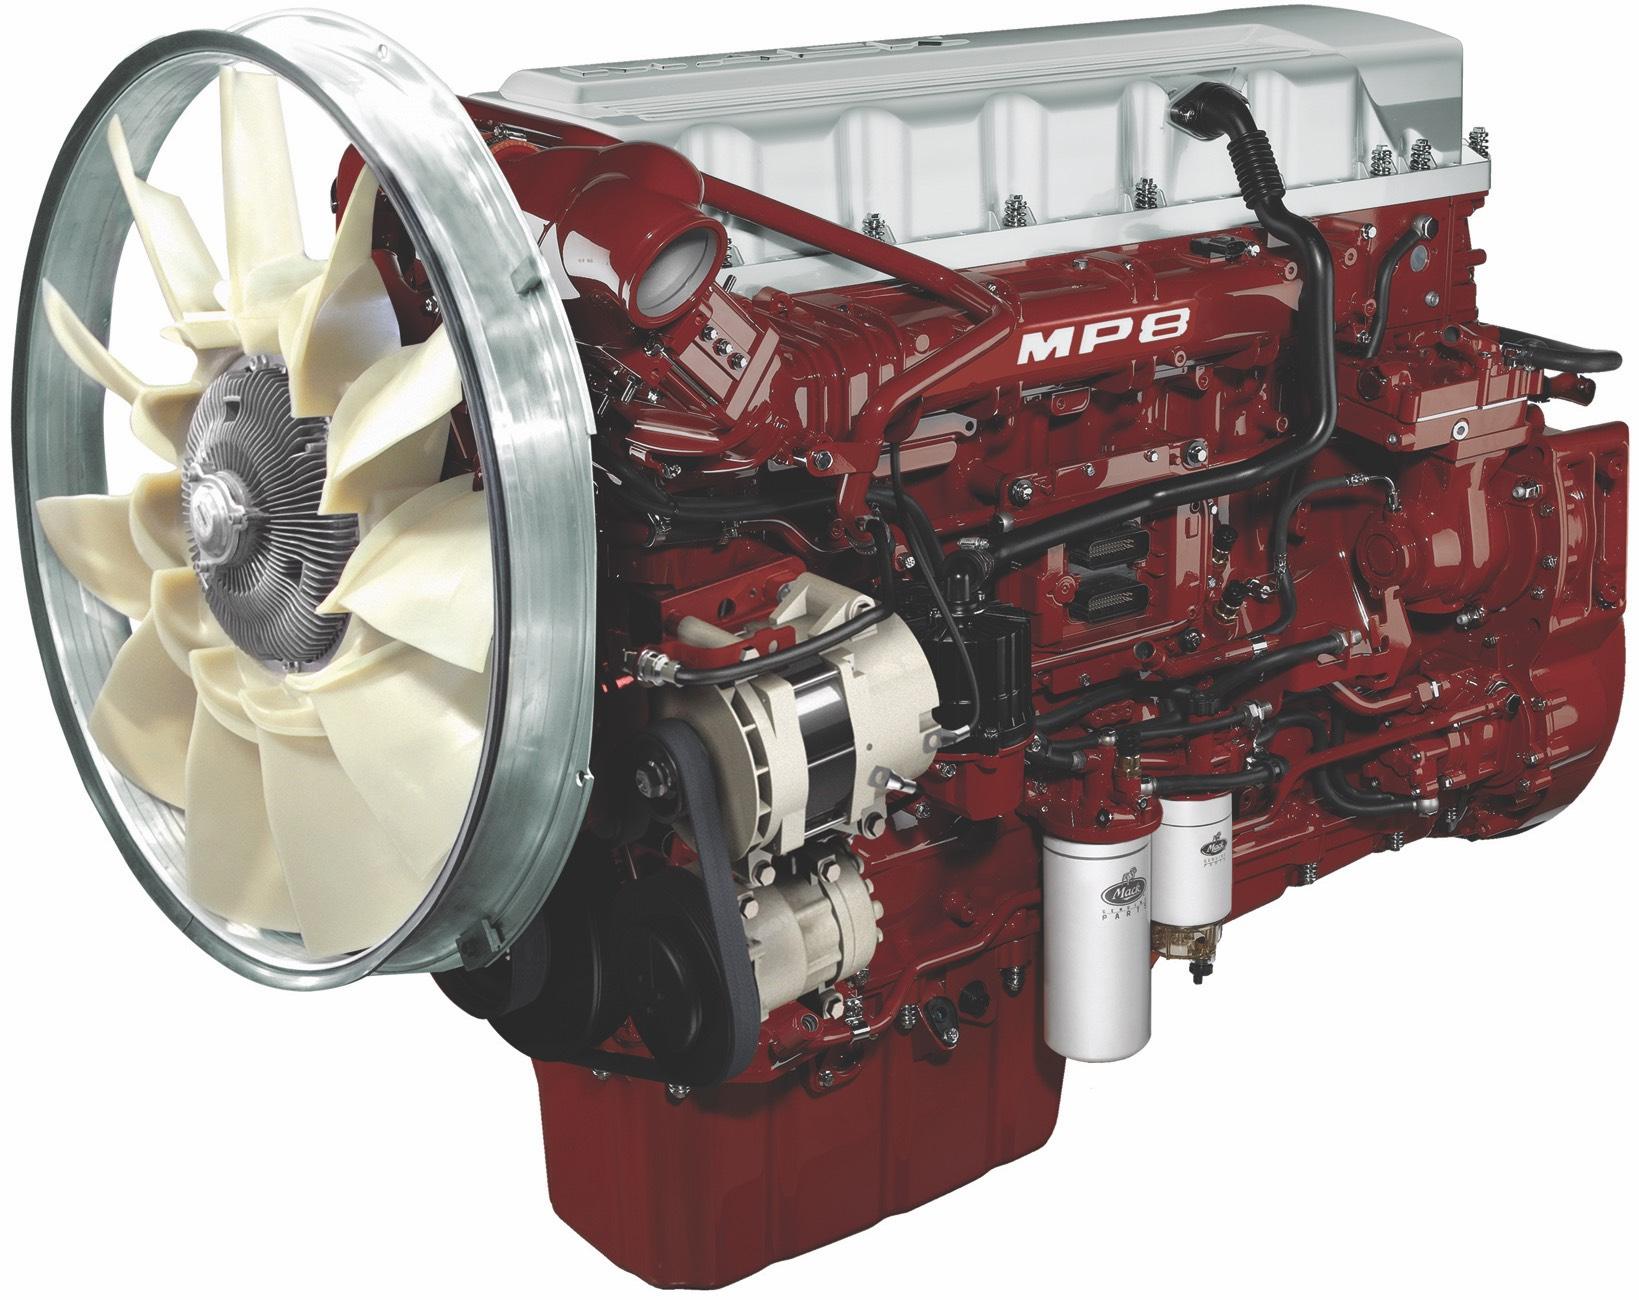 MACK Trucks Engine Factory Service & Shop Manual